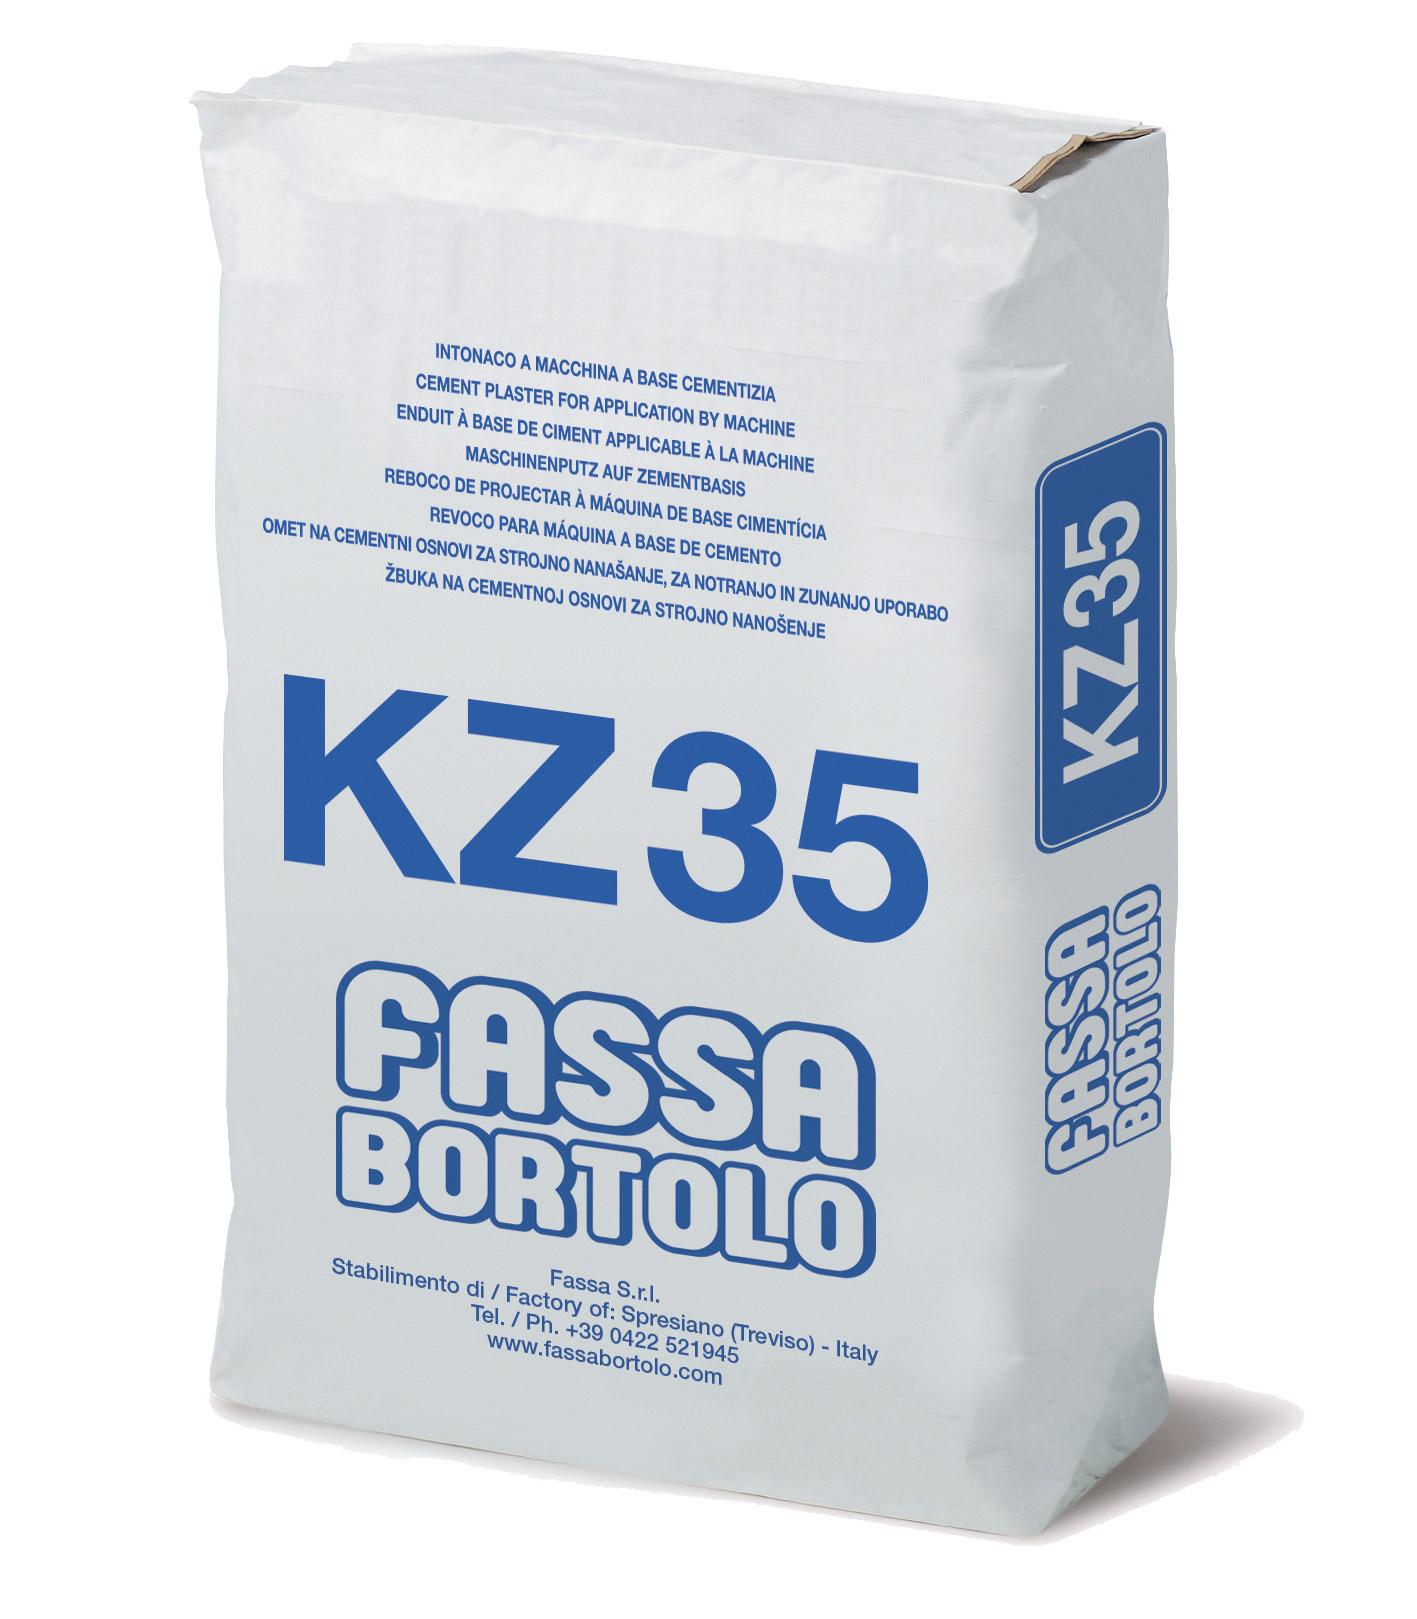 KZ 35